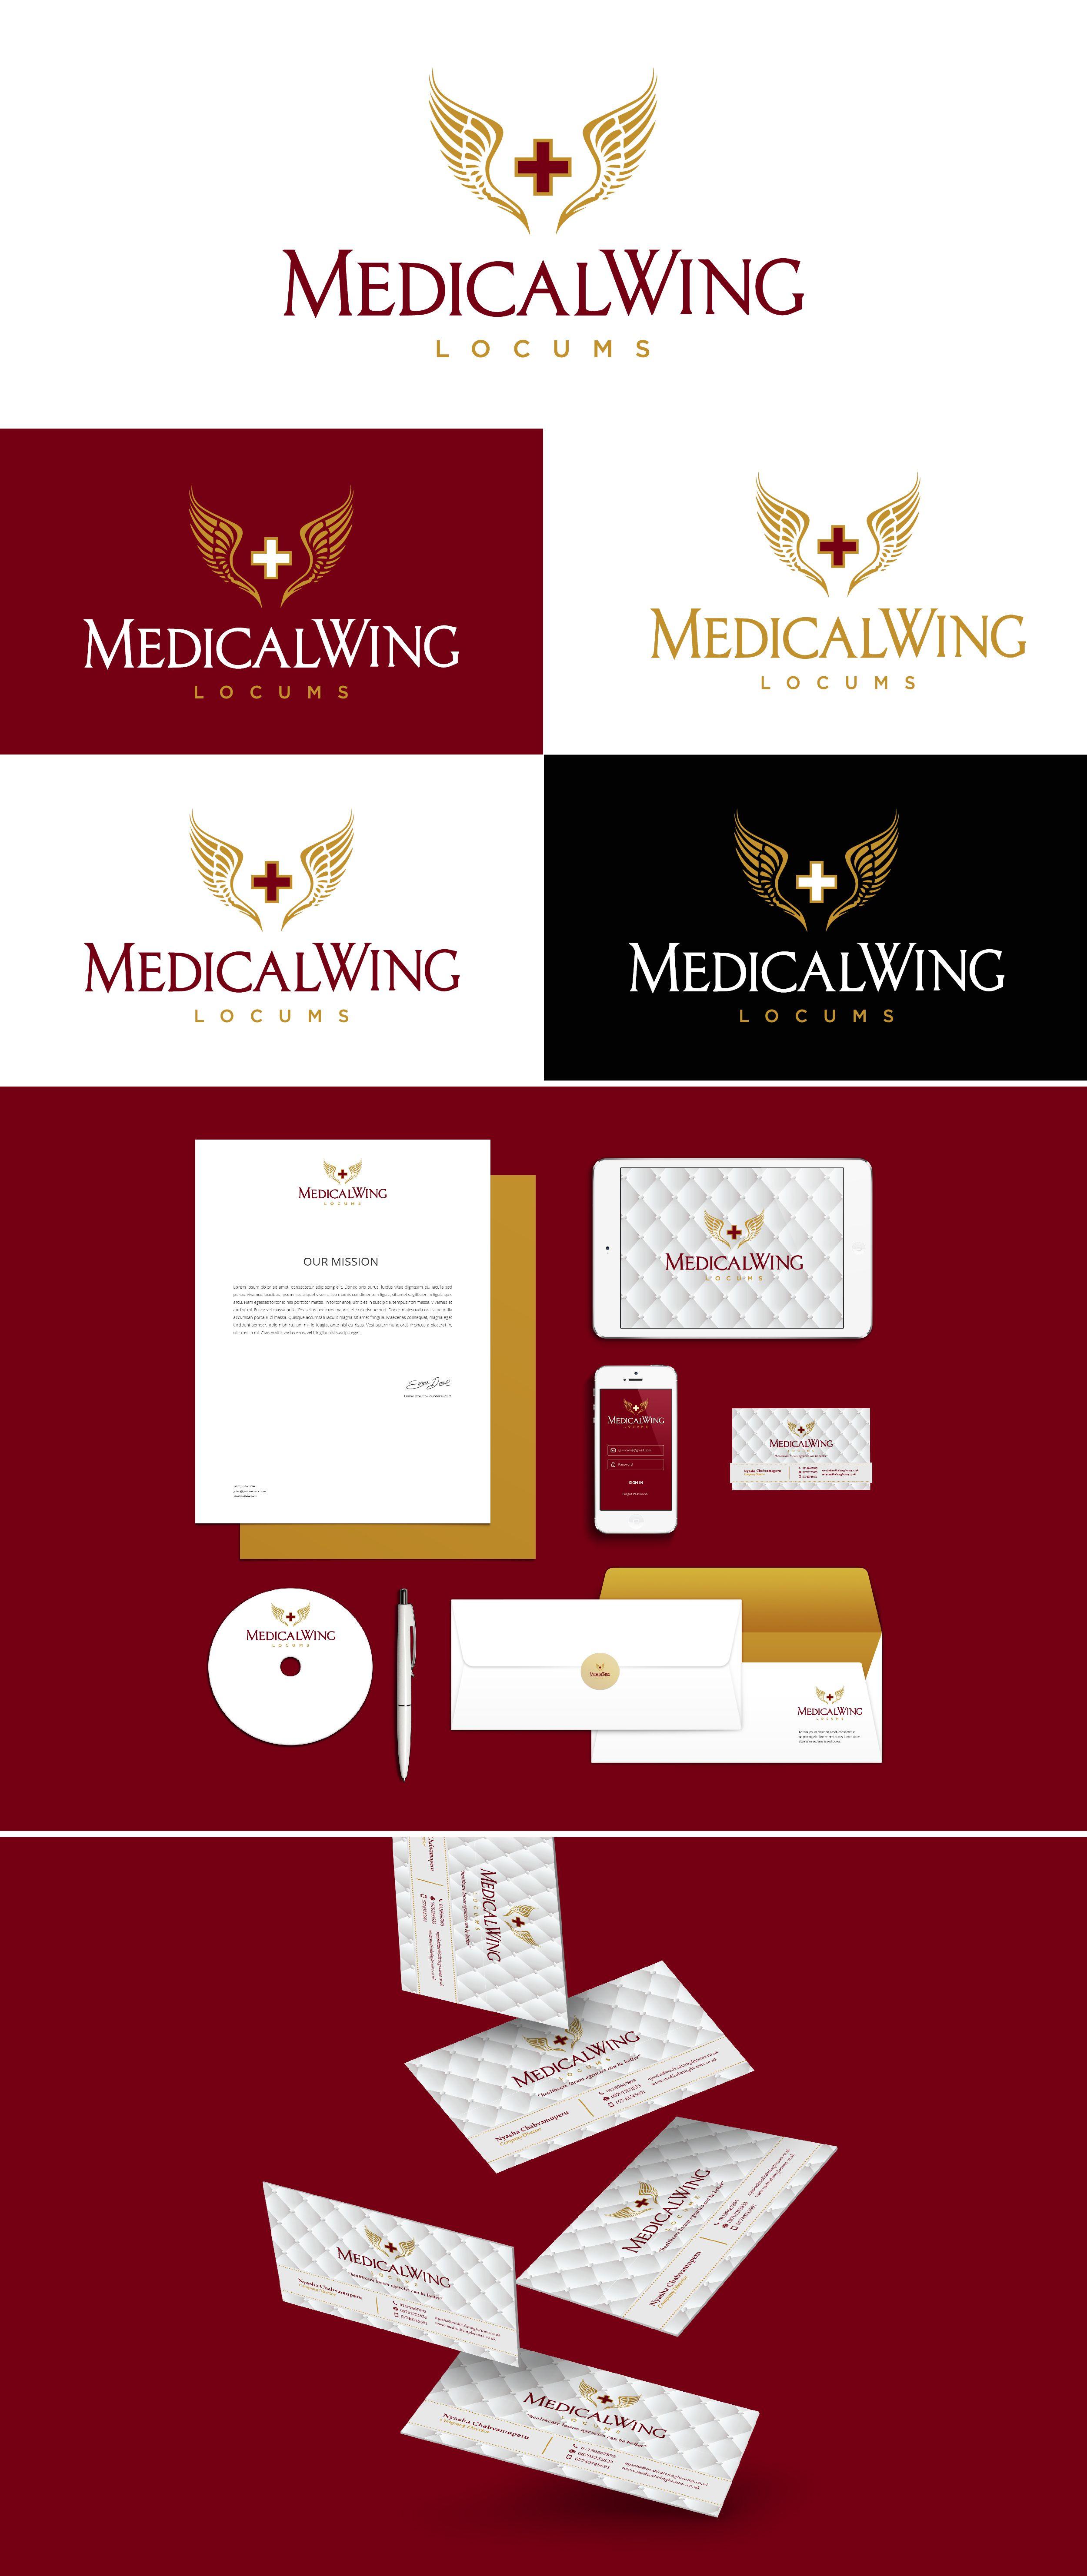 Medical Wing Locum Branding by Fivestar Branding   Fivestar Branding – Design…